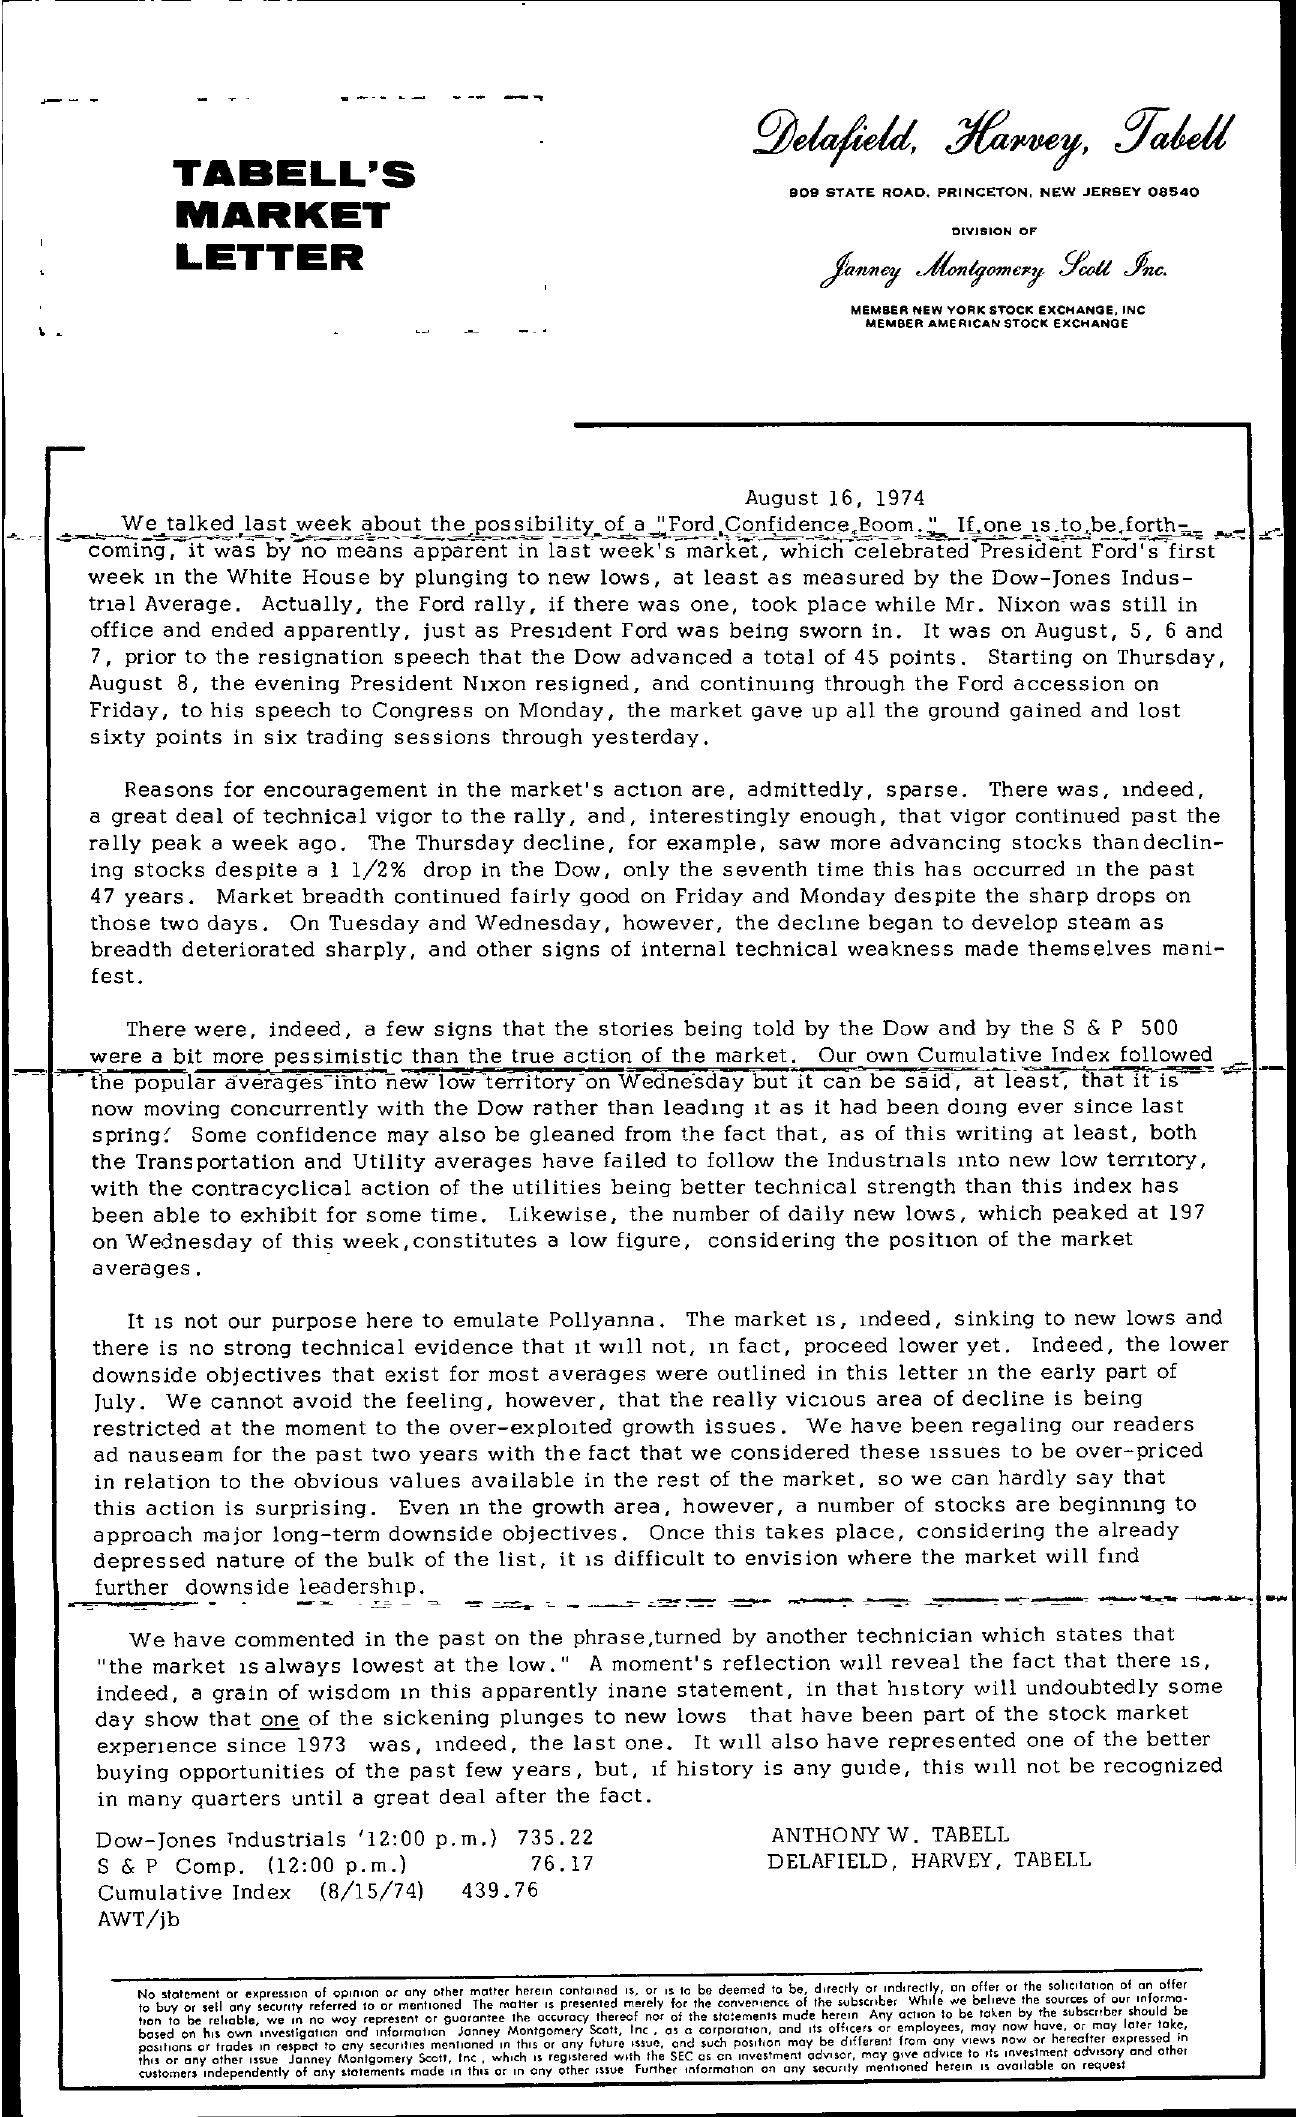 Tabell's Market Letter - August 16, 1974